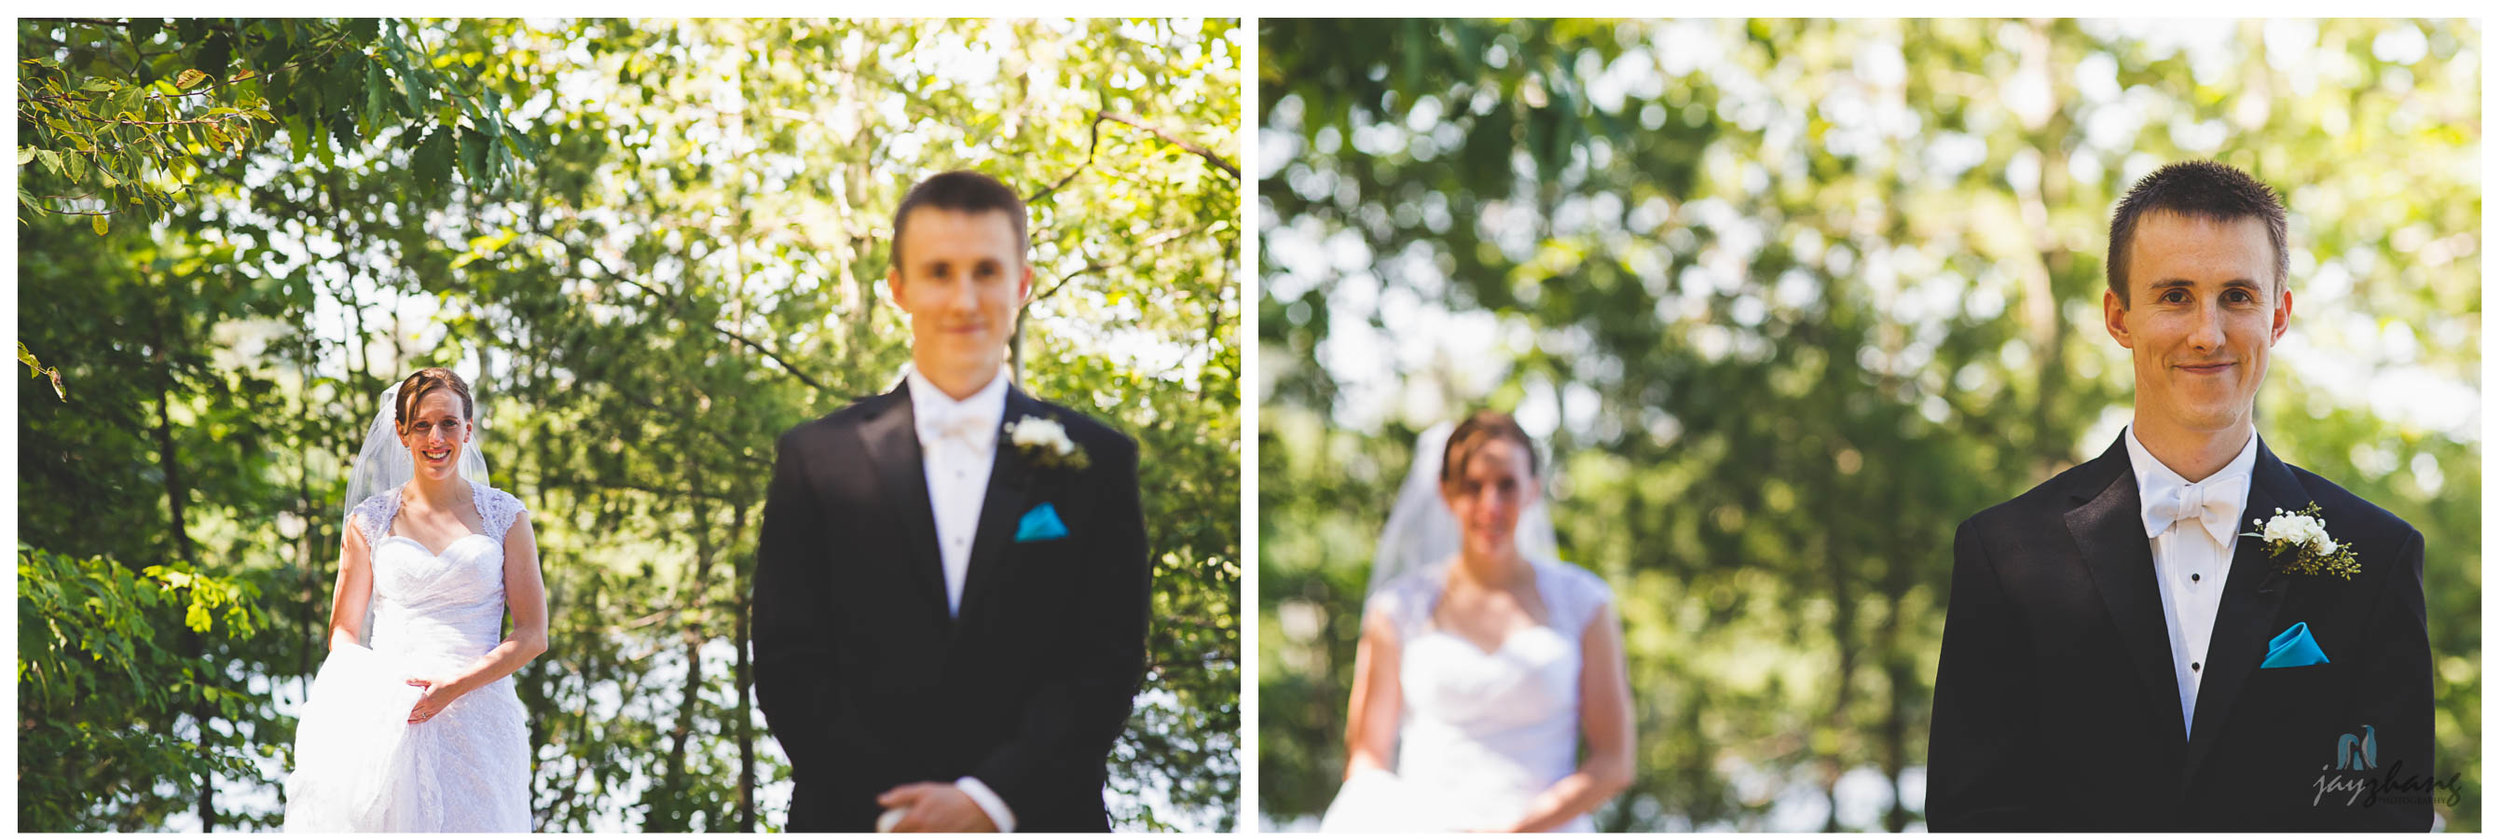 Albany_Wedding_Photographer (20).jpg